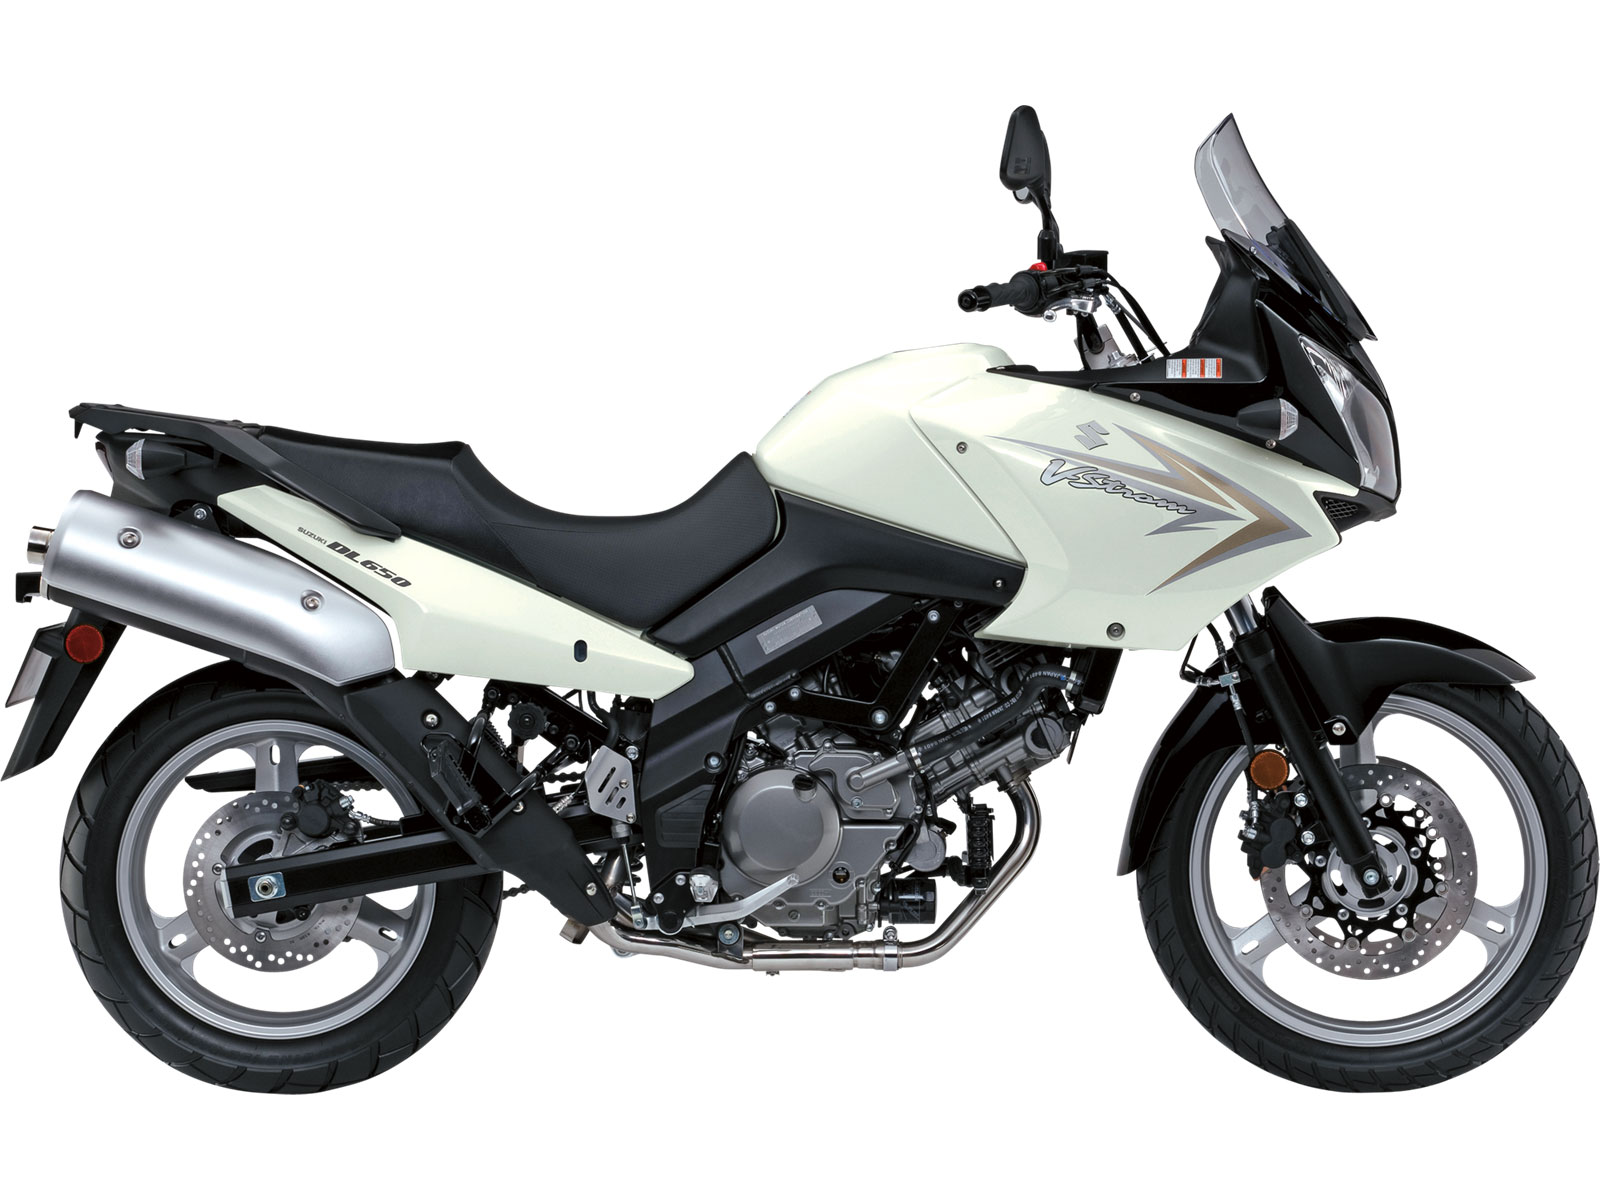 http://2.bp.blogspot.com/_ja0nvj5Jato/TI_6_GtYMhI/AAAAAAAAIJQ/b__QFrqUGfw/s1600/Suzuki_V_Strom_650_ABS_2011_motorcycle-1.jpg